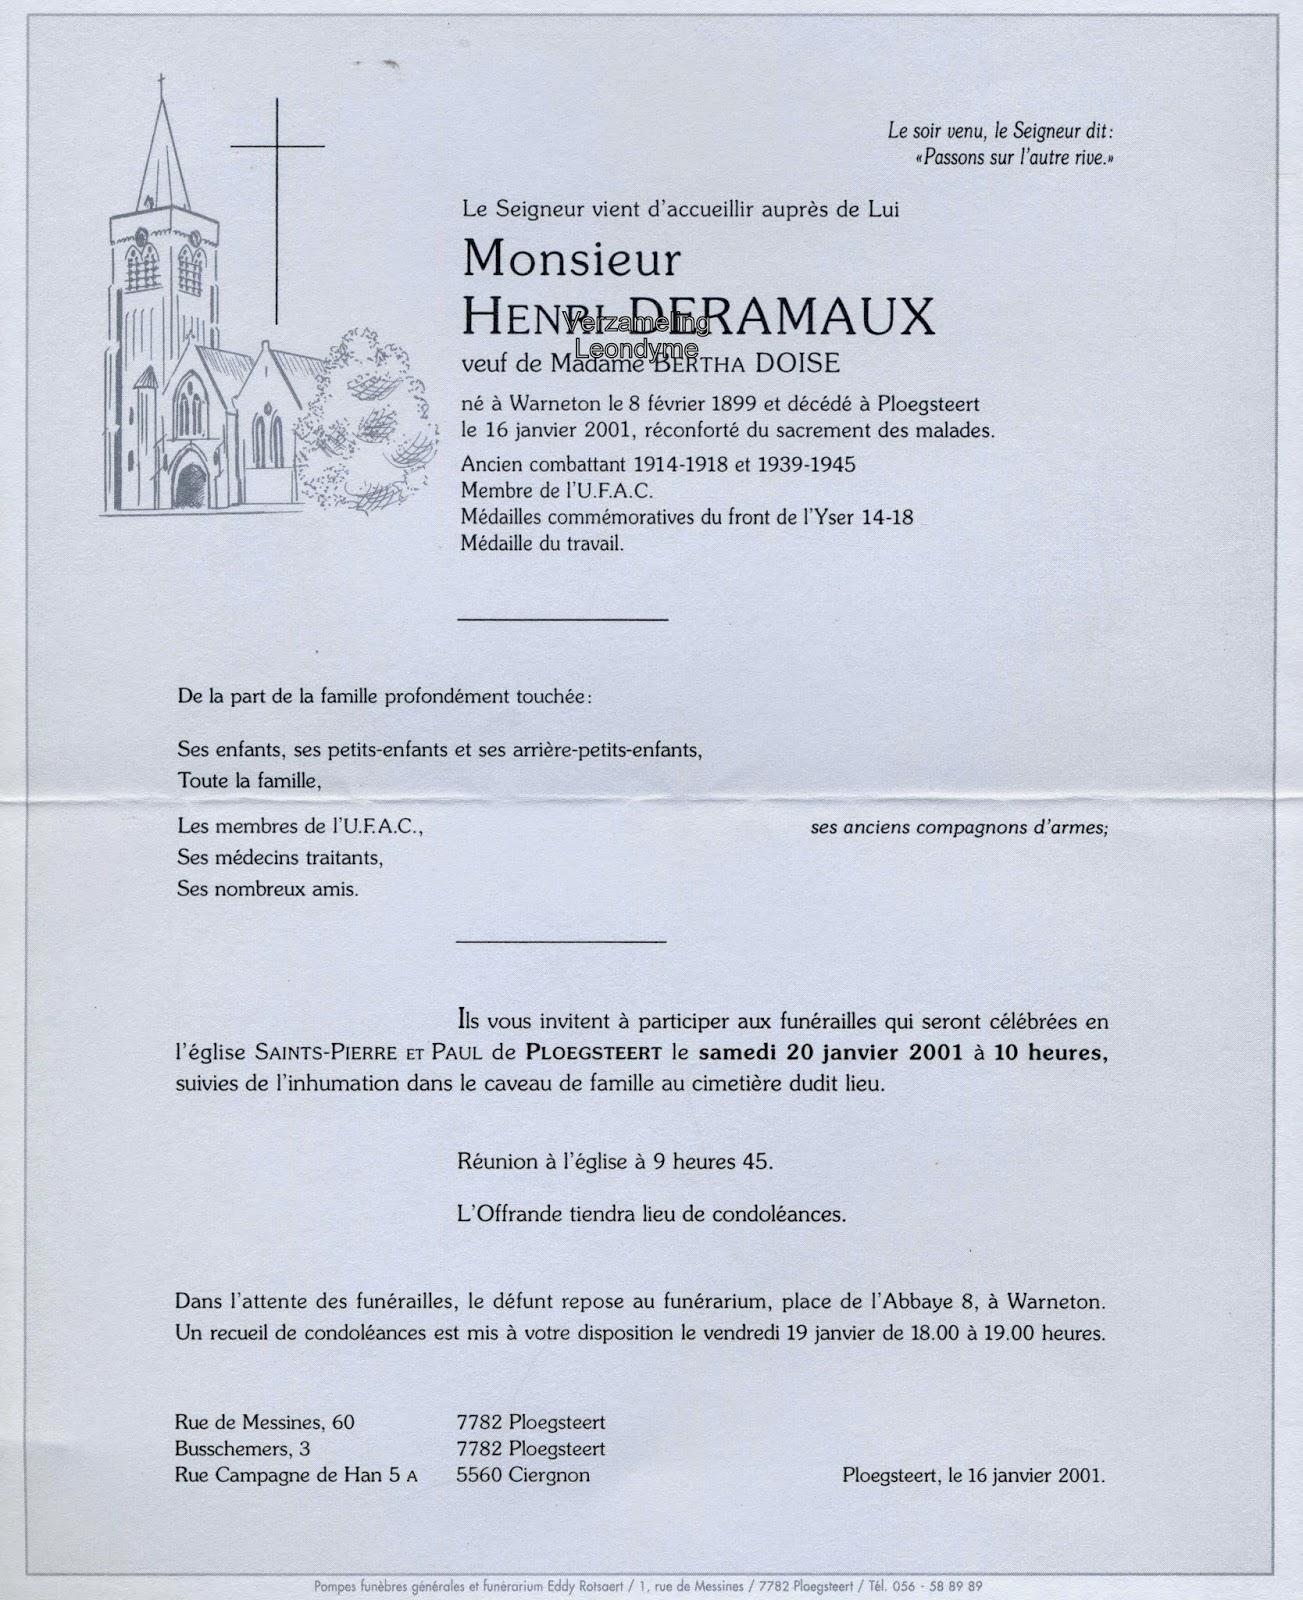 Rouwbrief Henri Deramaux 1899-2001. Verzameling Leondyme